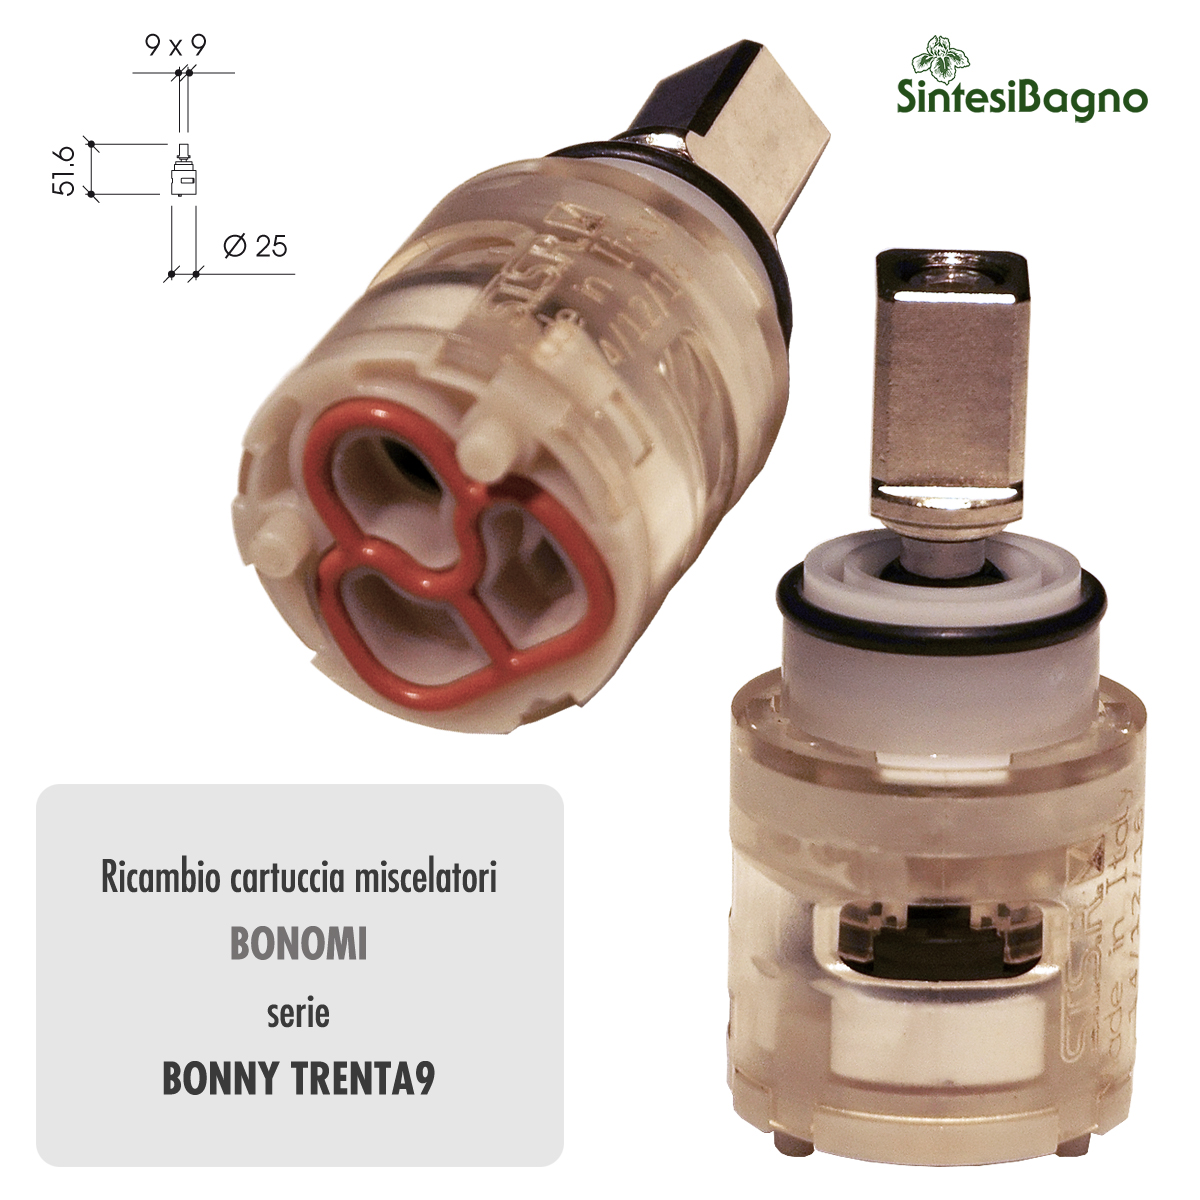 Cartuccia ceramica BONOMI Ø mm 25 per rubinetterie serie BONNY TRENTA9